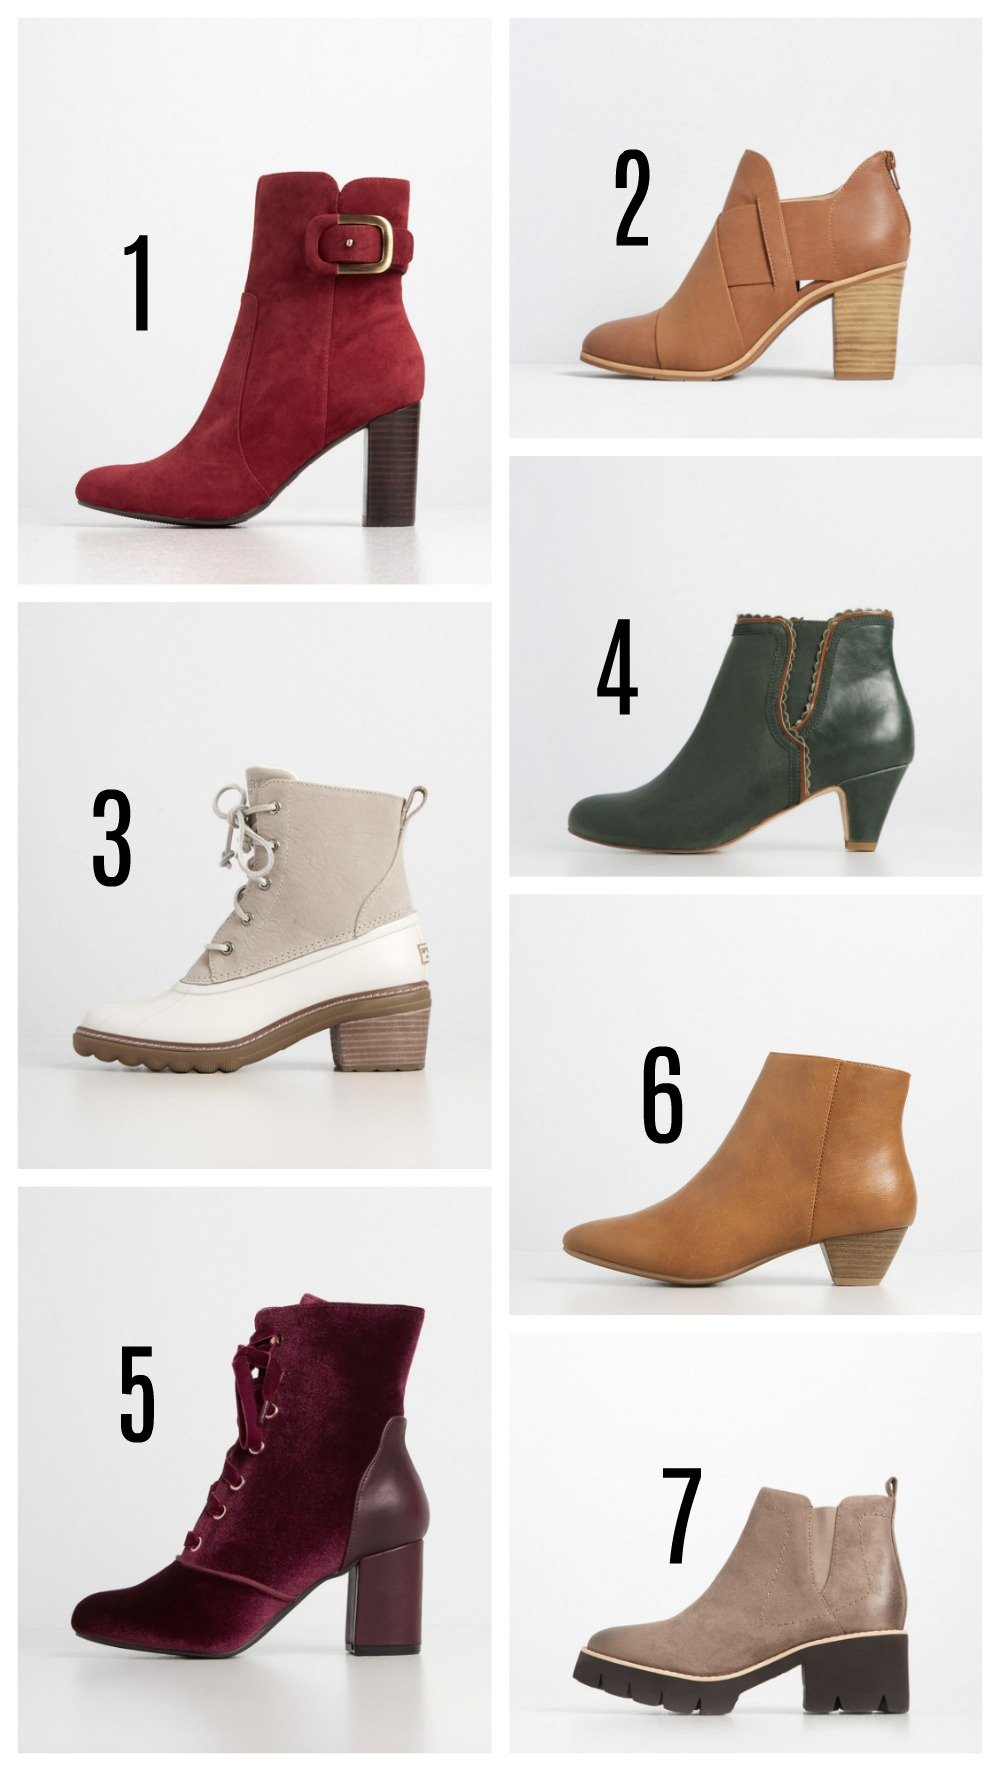 Modcloth Fall Boots for 2020 I Dreaminlace.com #Womensfashion #fallfashion #boots